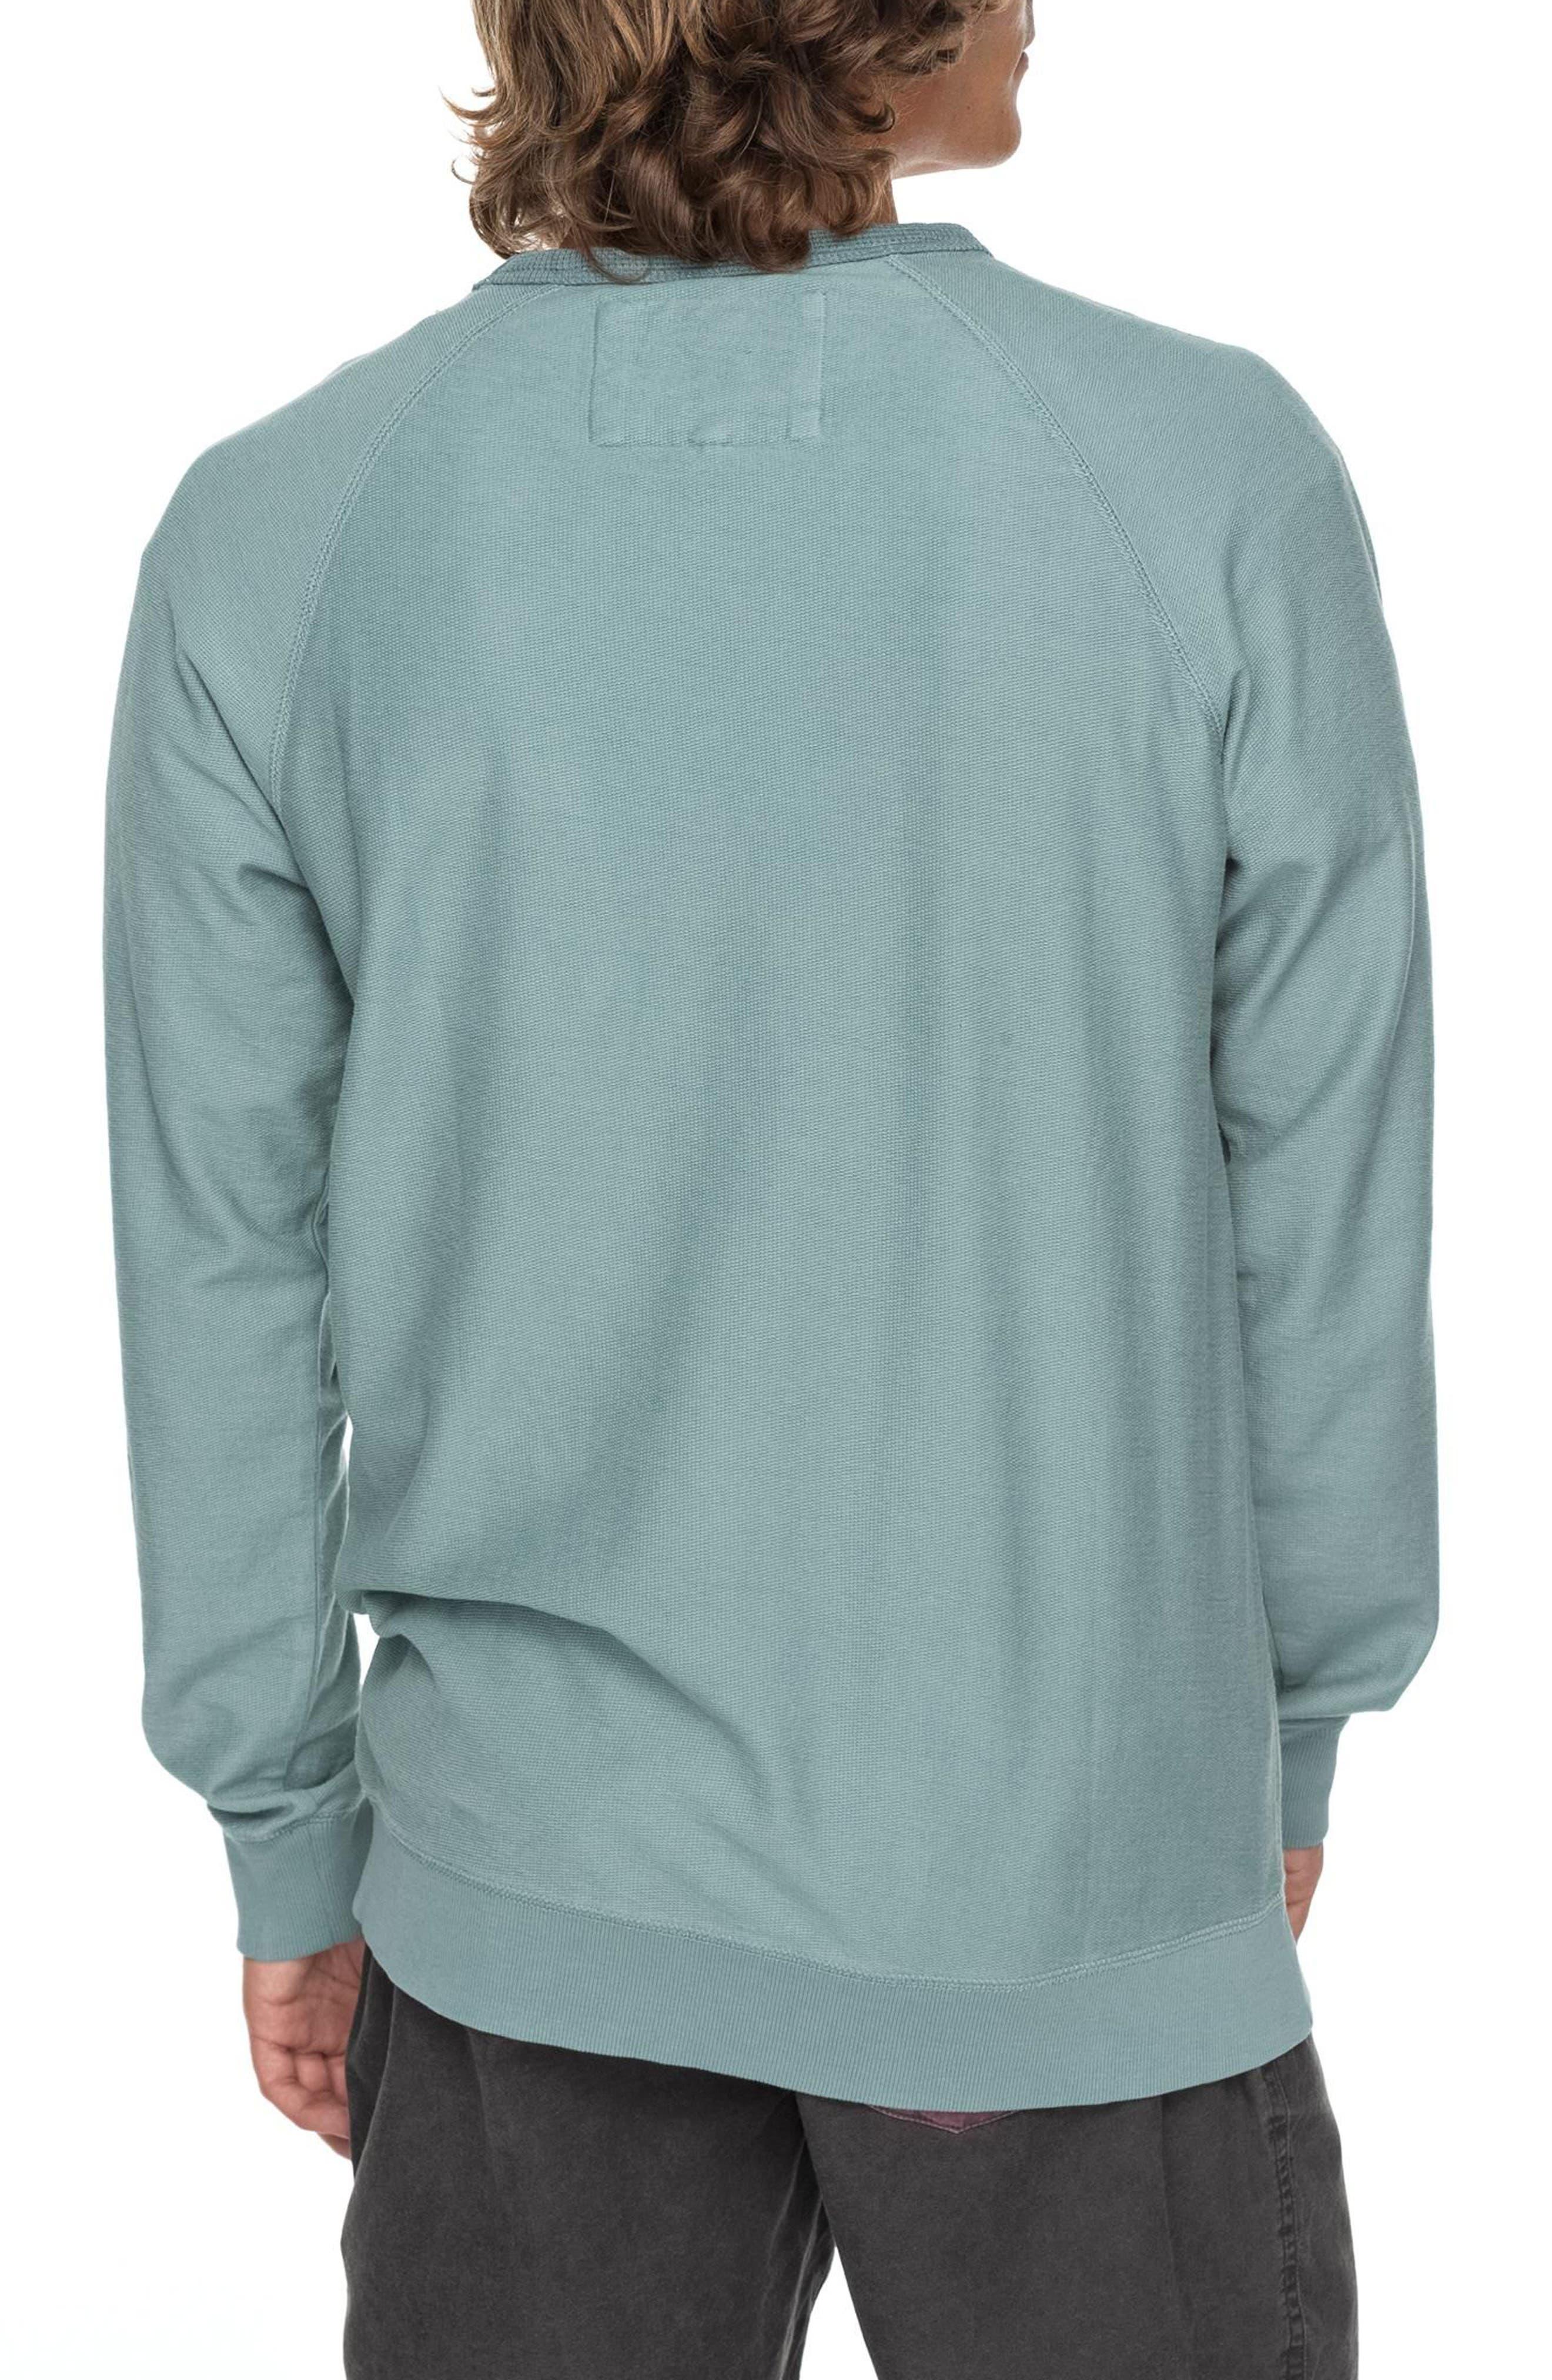 Baao Sweatshirt,                             Alternate thumbnail 2, color,                             Trellis